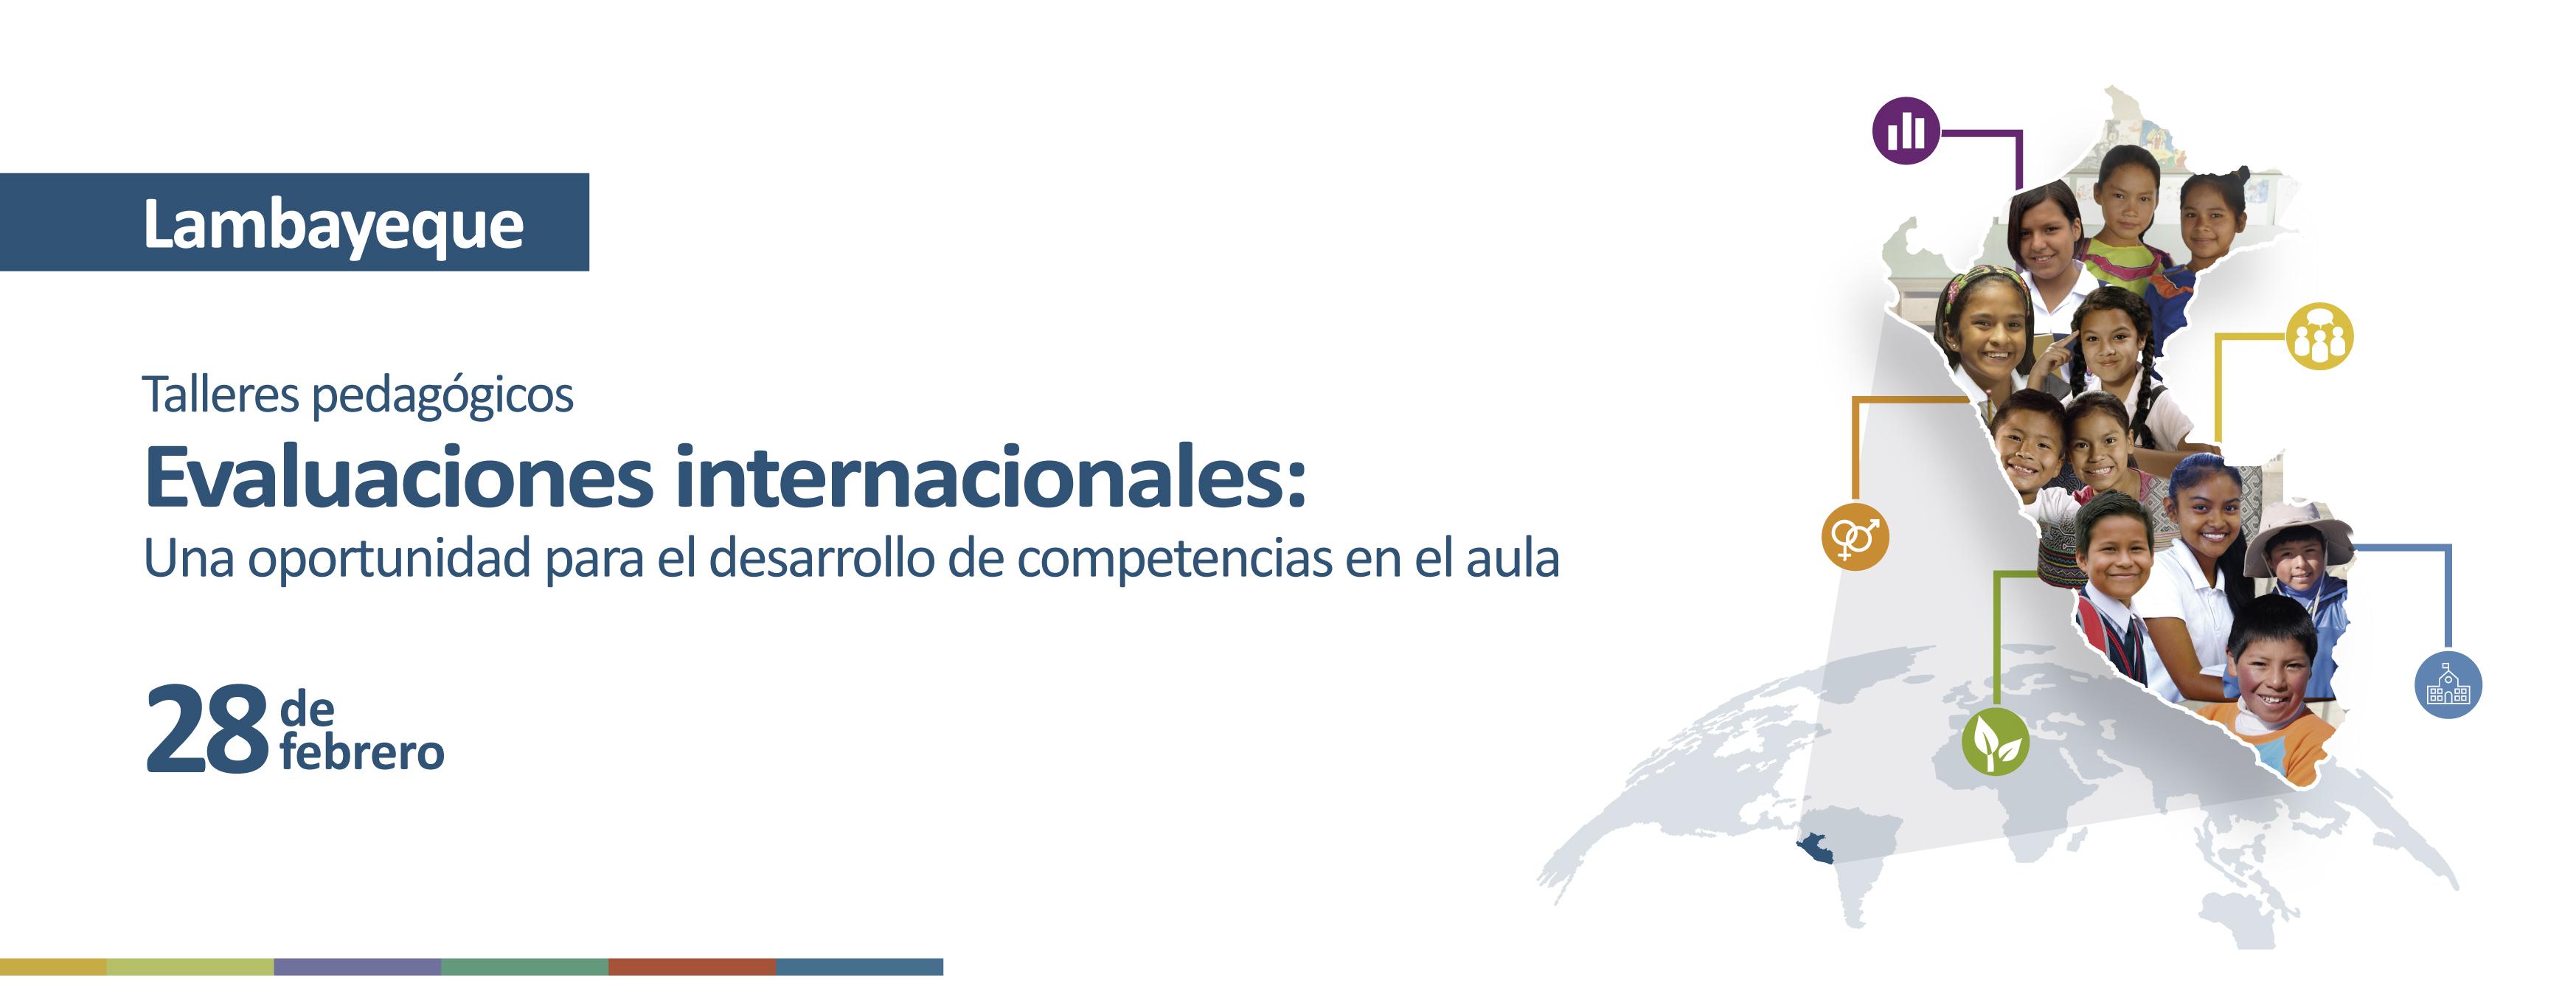 cabecera Taller pedagogico Lambayeque